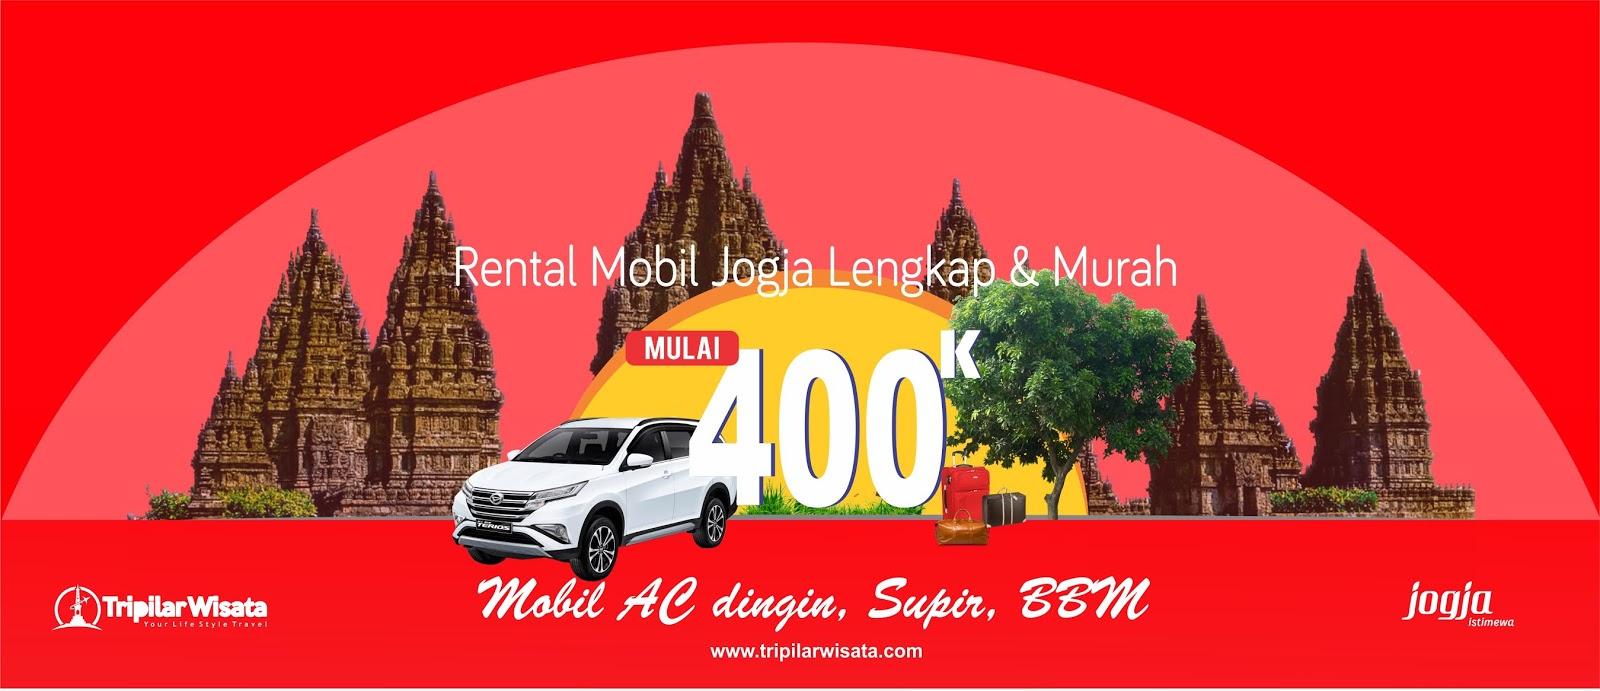 tour and travel jogja | sewa rental mobil | paket tour liburan wisata yogyakarta | 2019